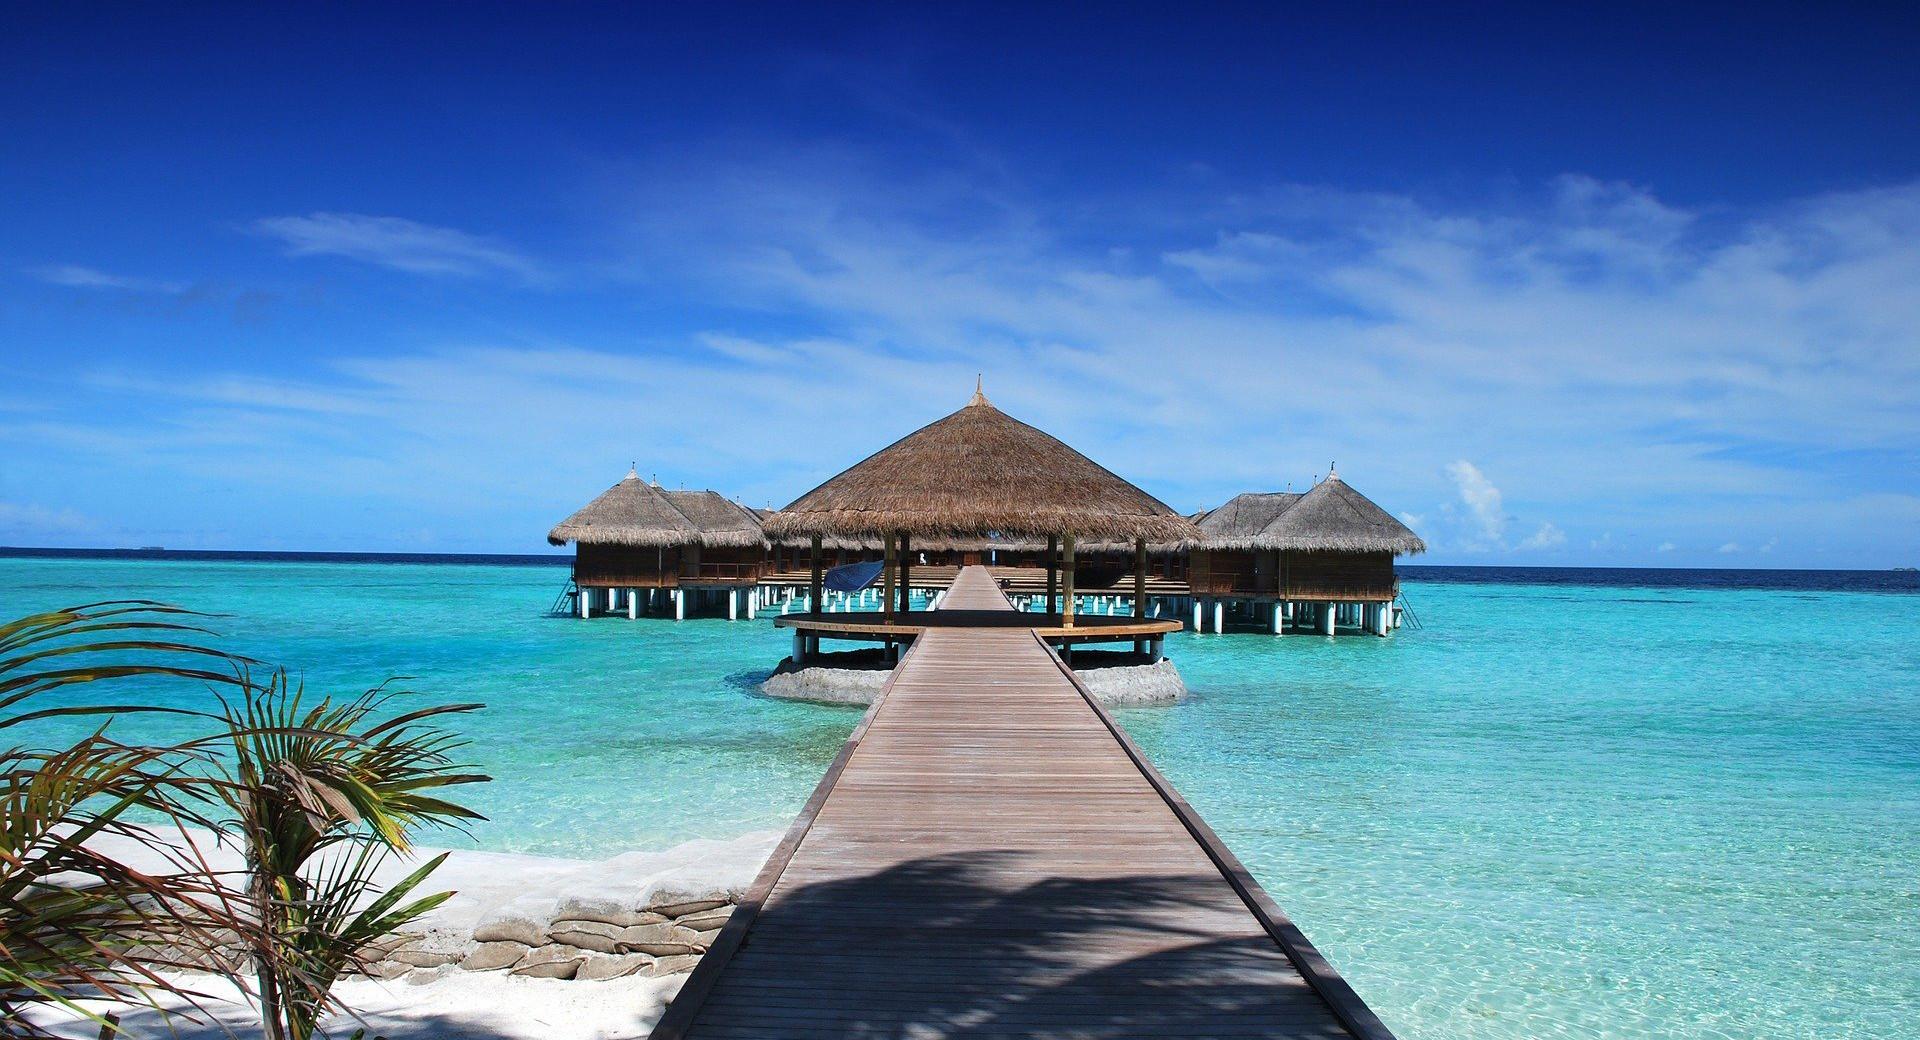 news-main-maldives-puts-niche-markets-at-centre-of-2020-tourism-strategy.1574245455.jpg